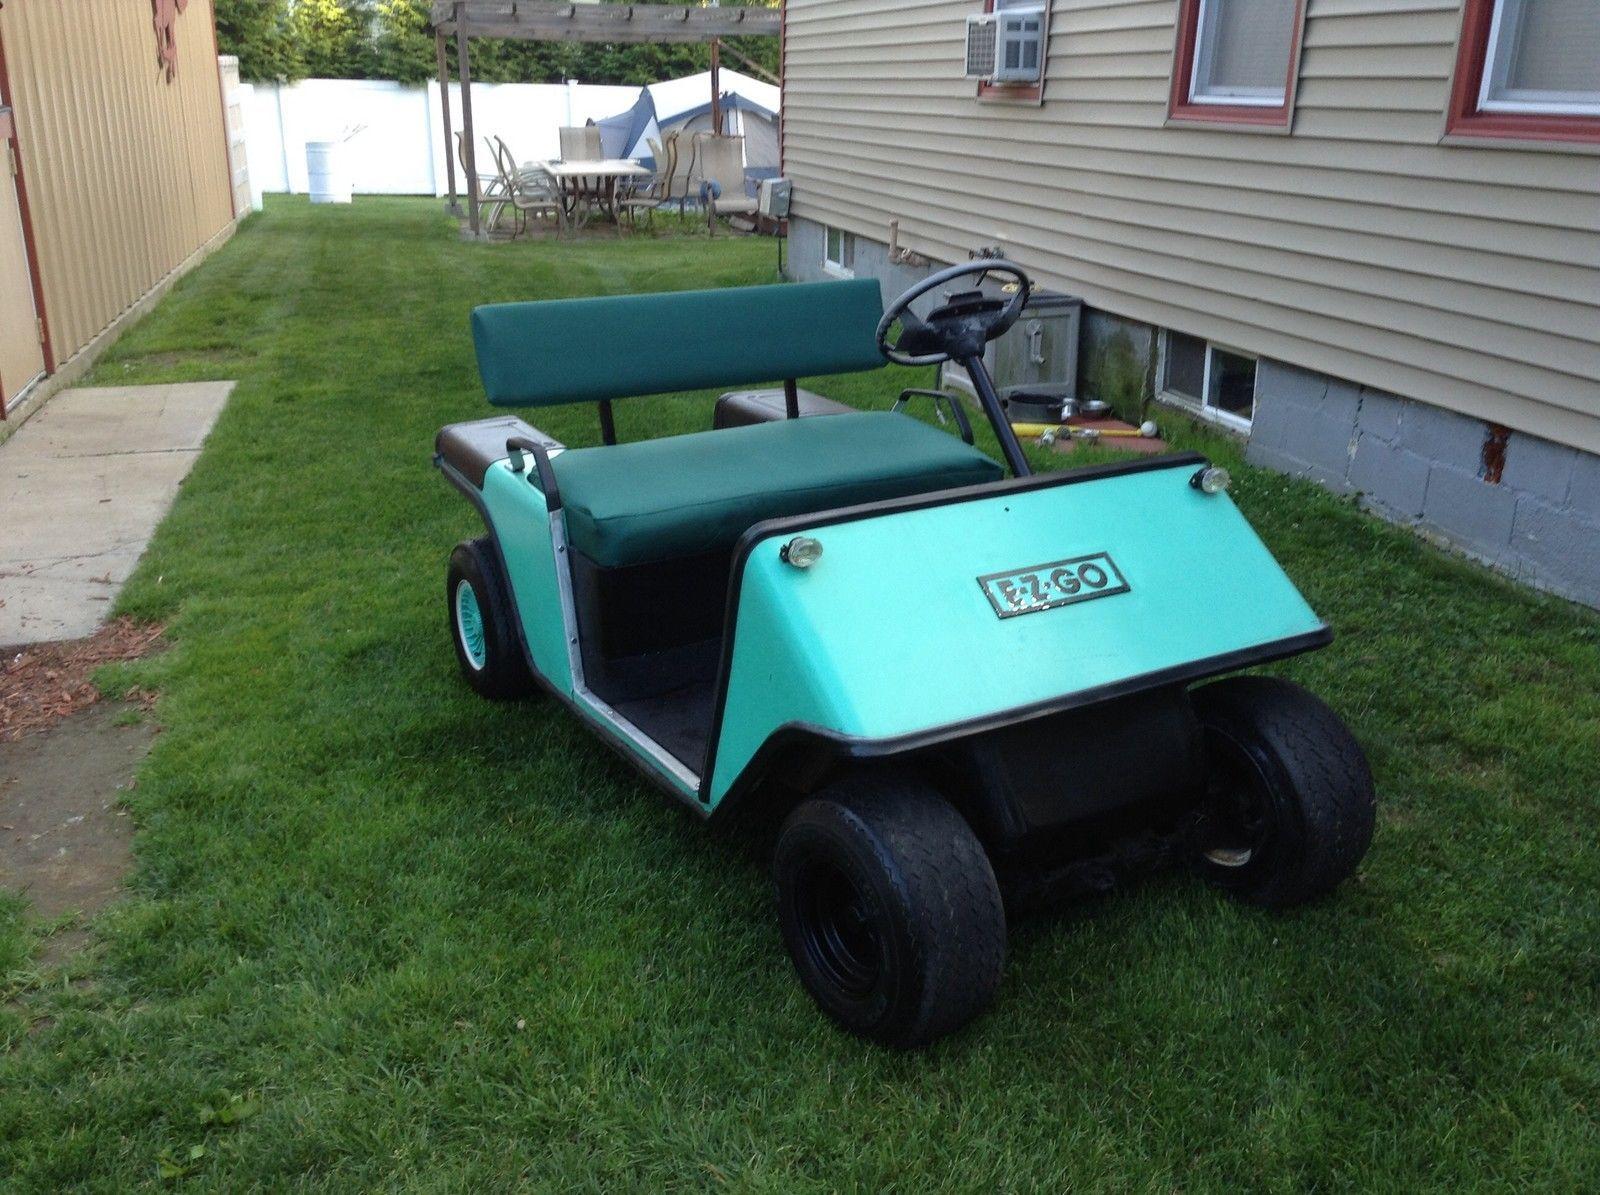 1985 EZ GO Golf Car | Vintage Golf | Pinterest | Vintage golf and Golf